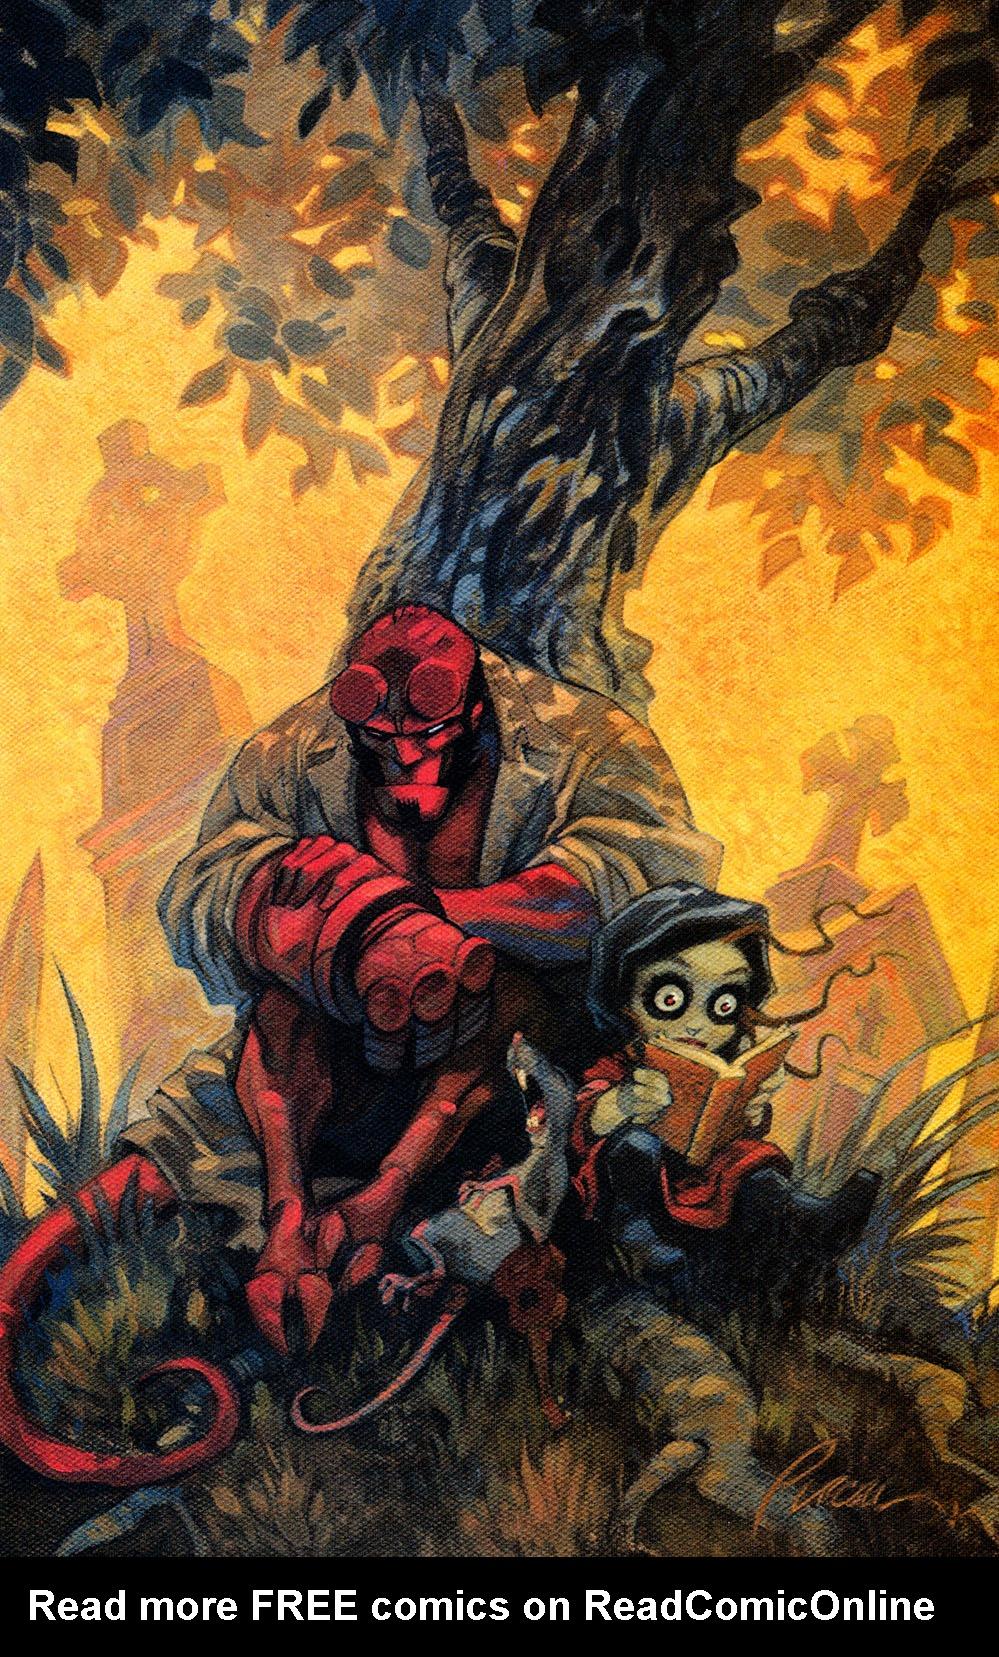 Read online Hellboy: Weird Tales comic -  Issue #6 - 25